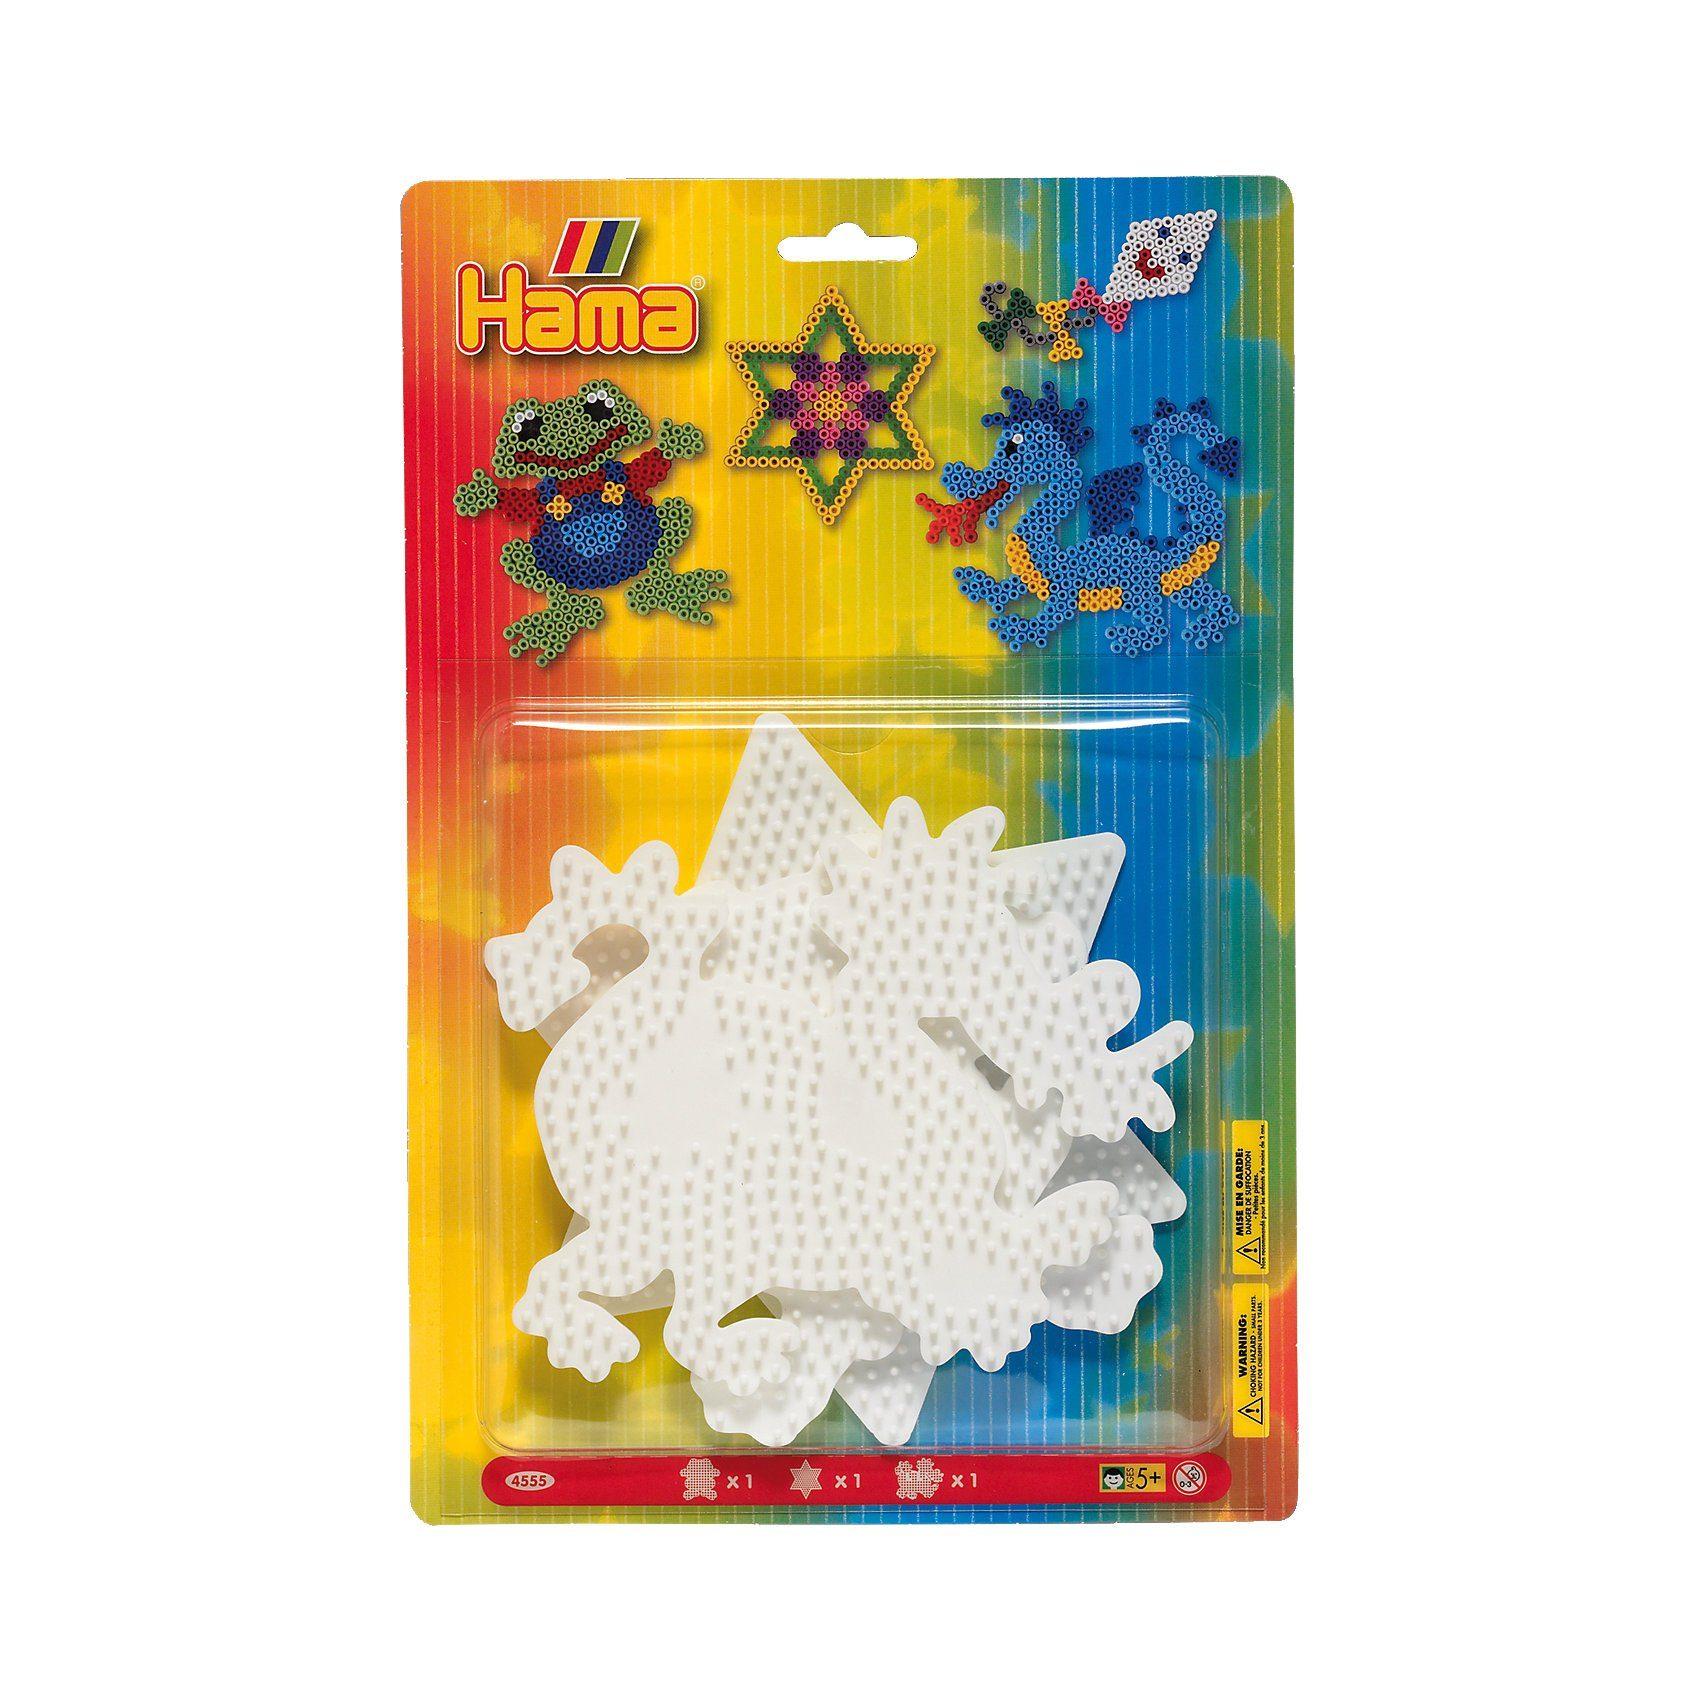 Hama Perlen HAMA 4555 midi-Stiftplatten Frosch, Stern & Drache